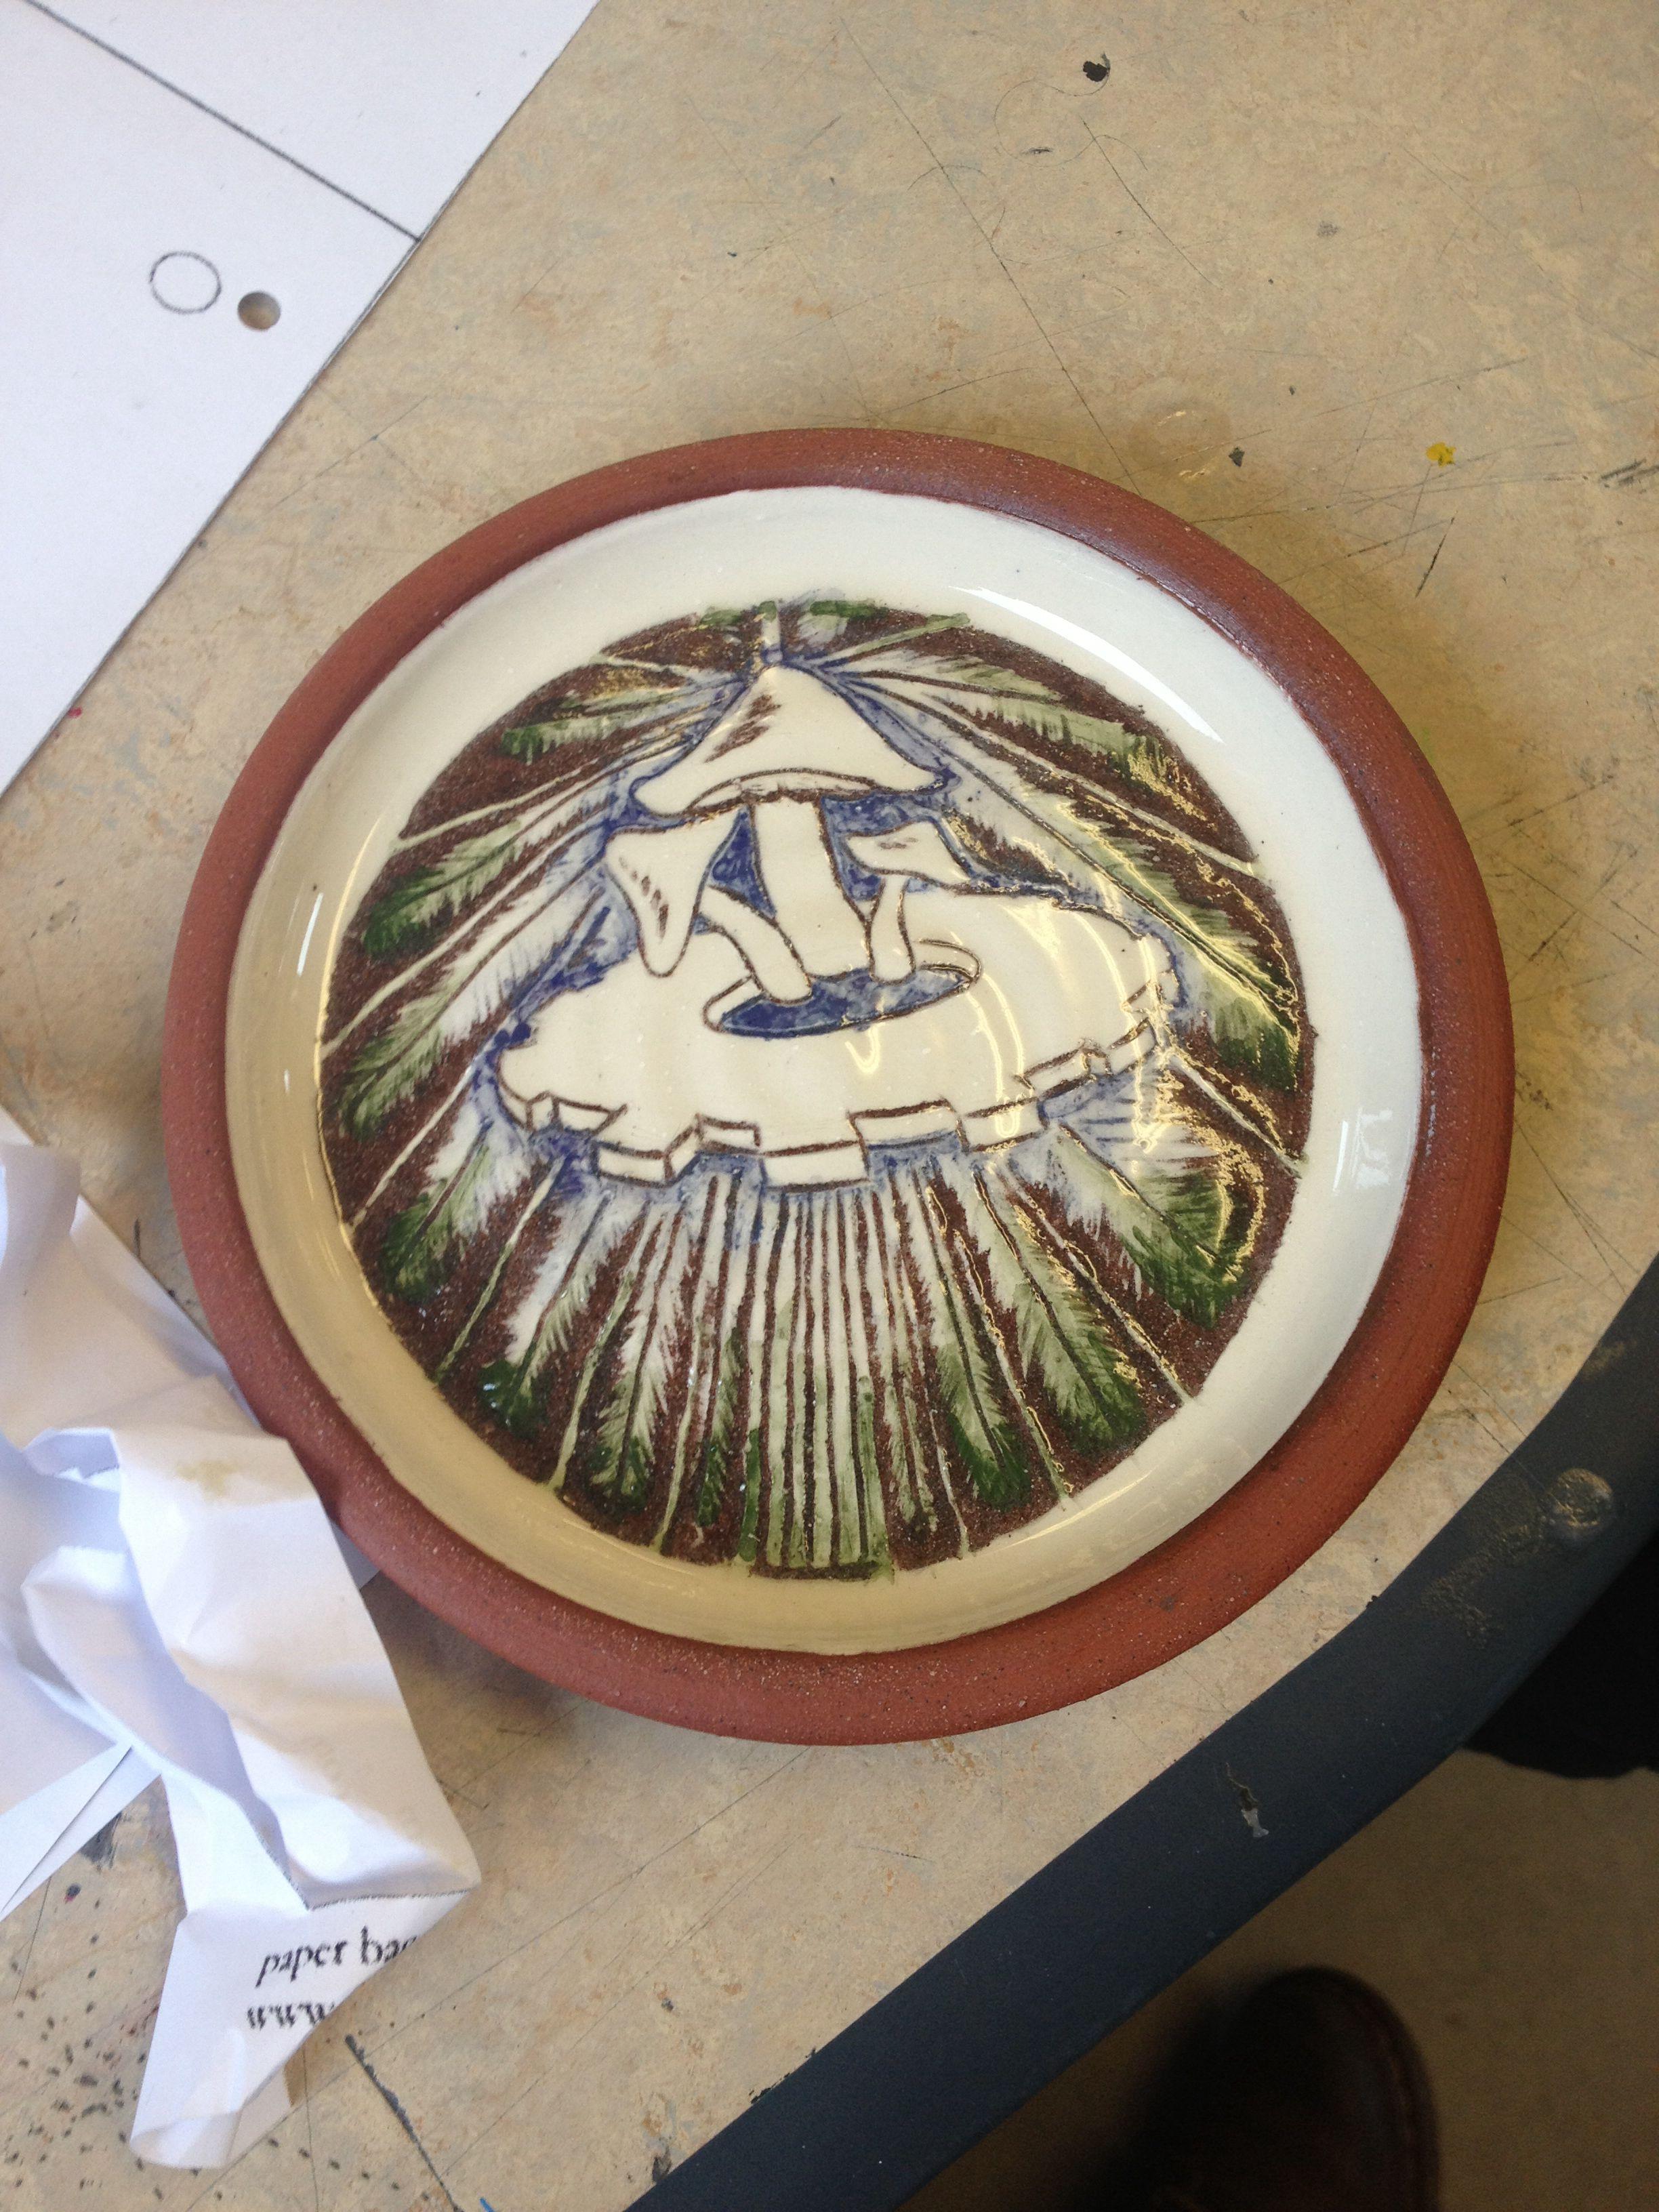 amygration - ceramic plate (organic and industrial)